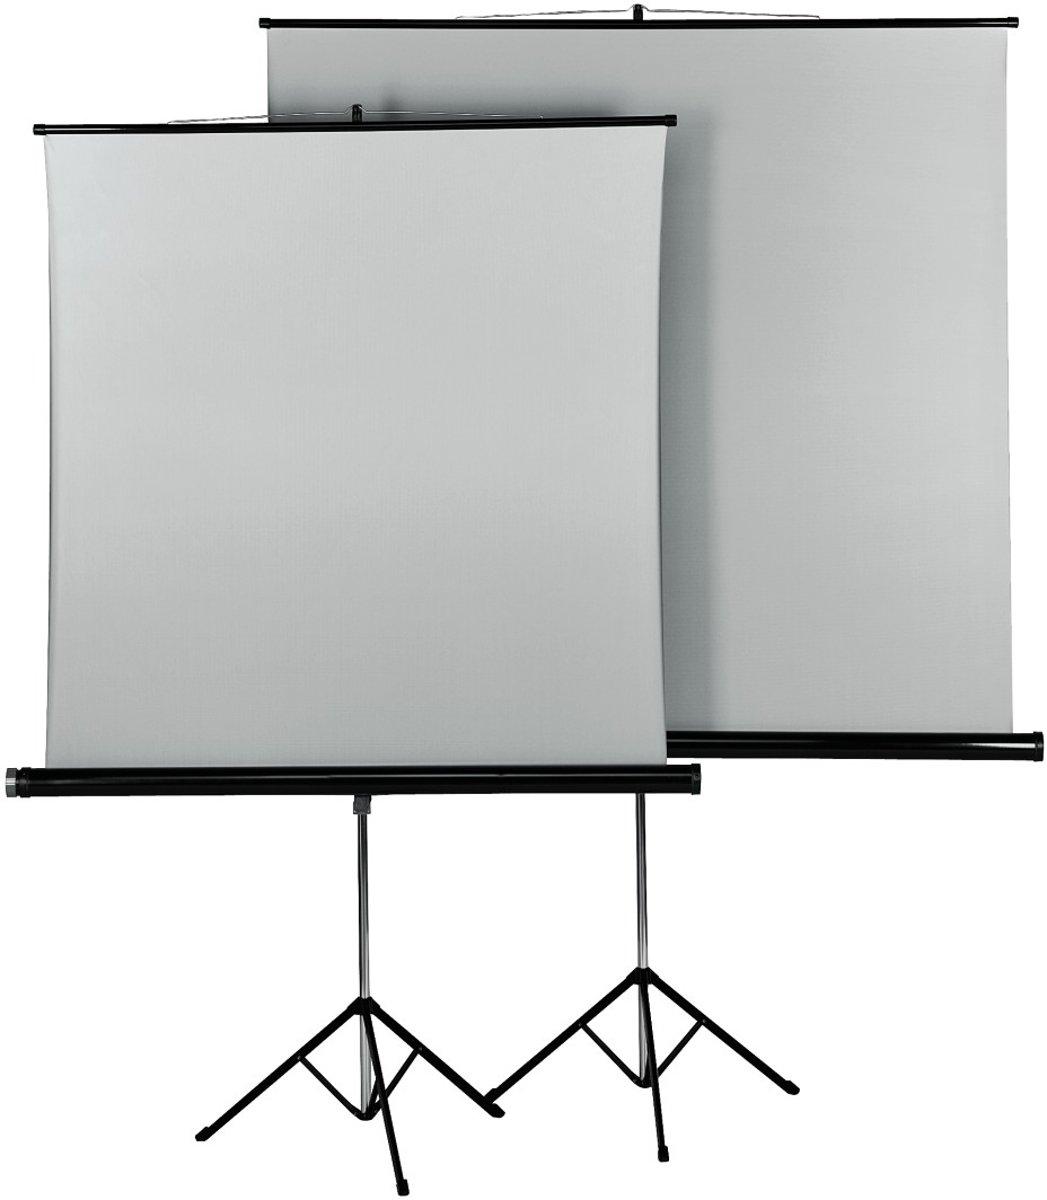 Hama Tripod Projectiescherm, 155 x 155cm, Duo kopen